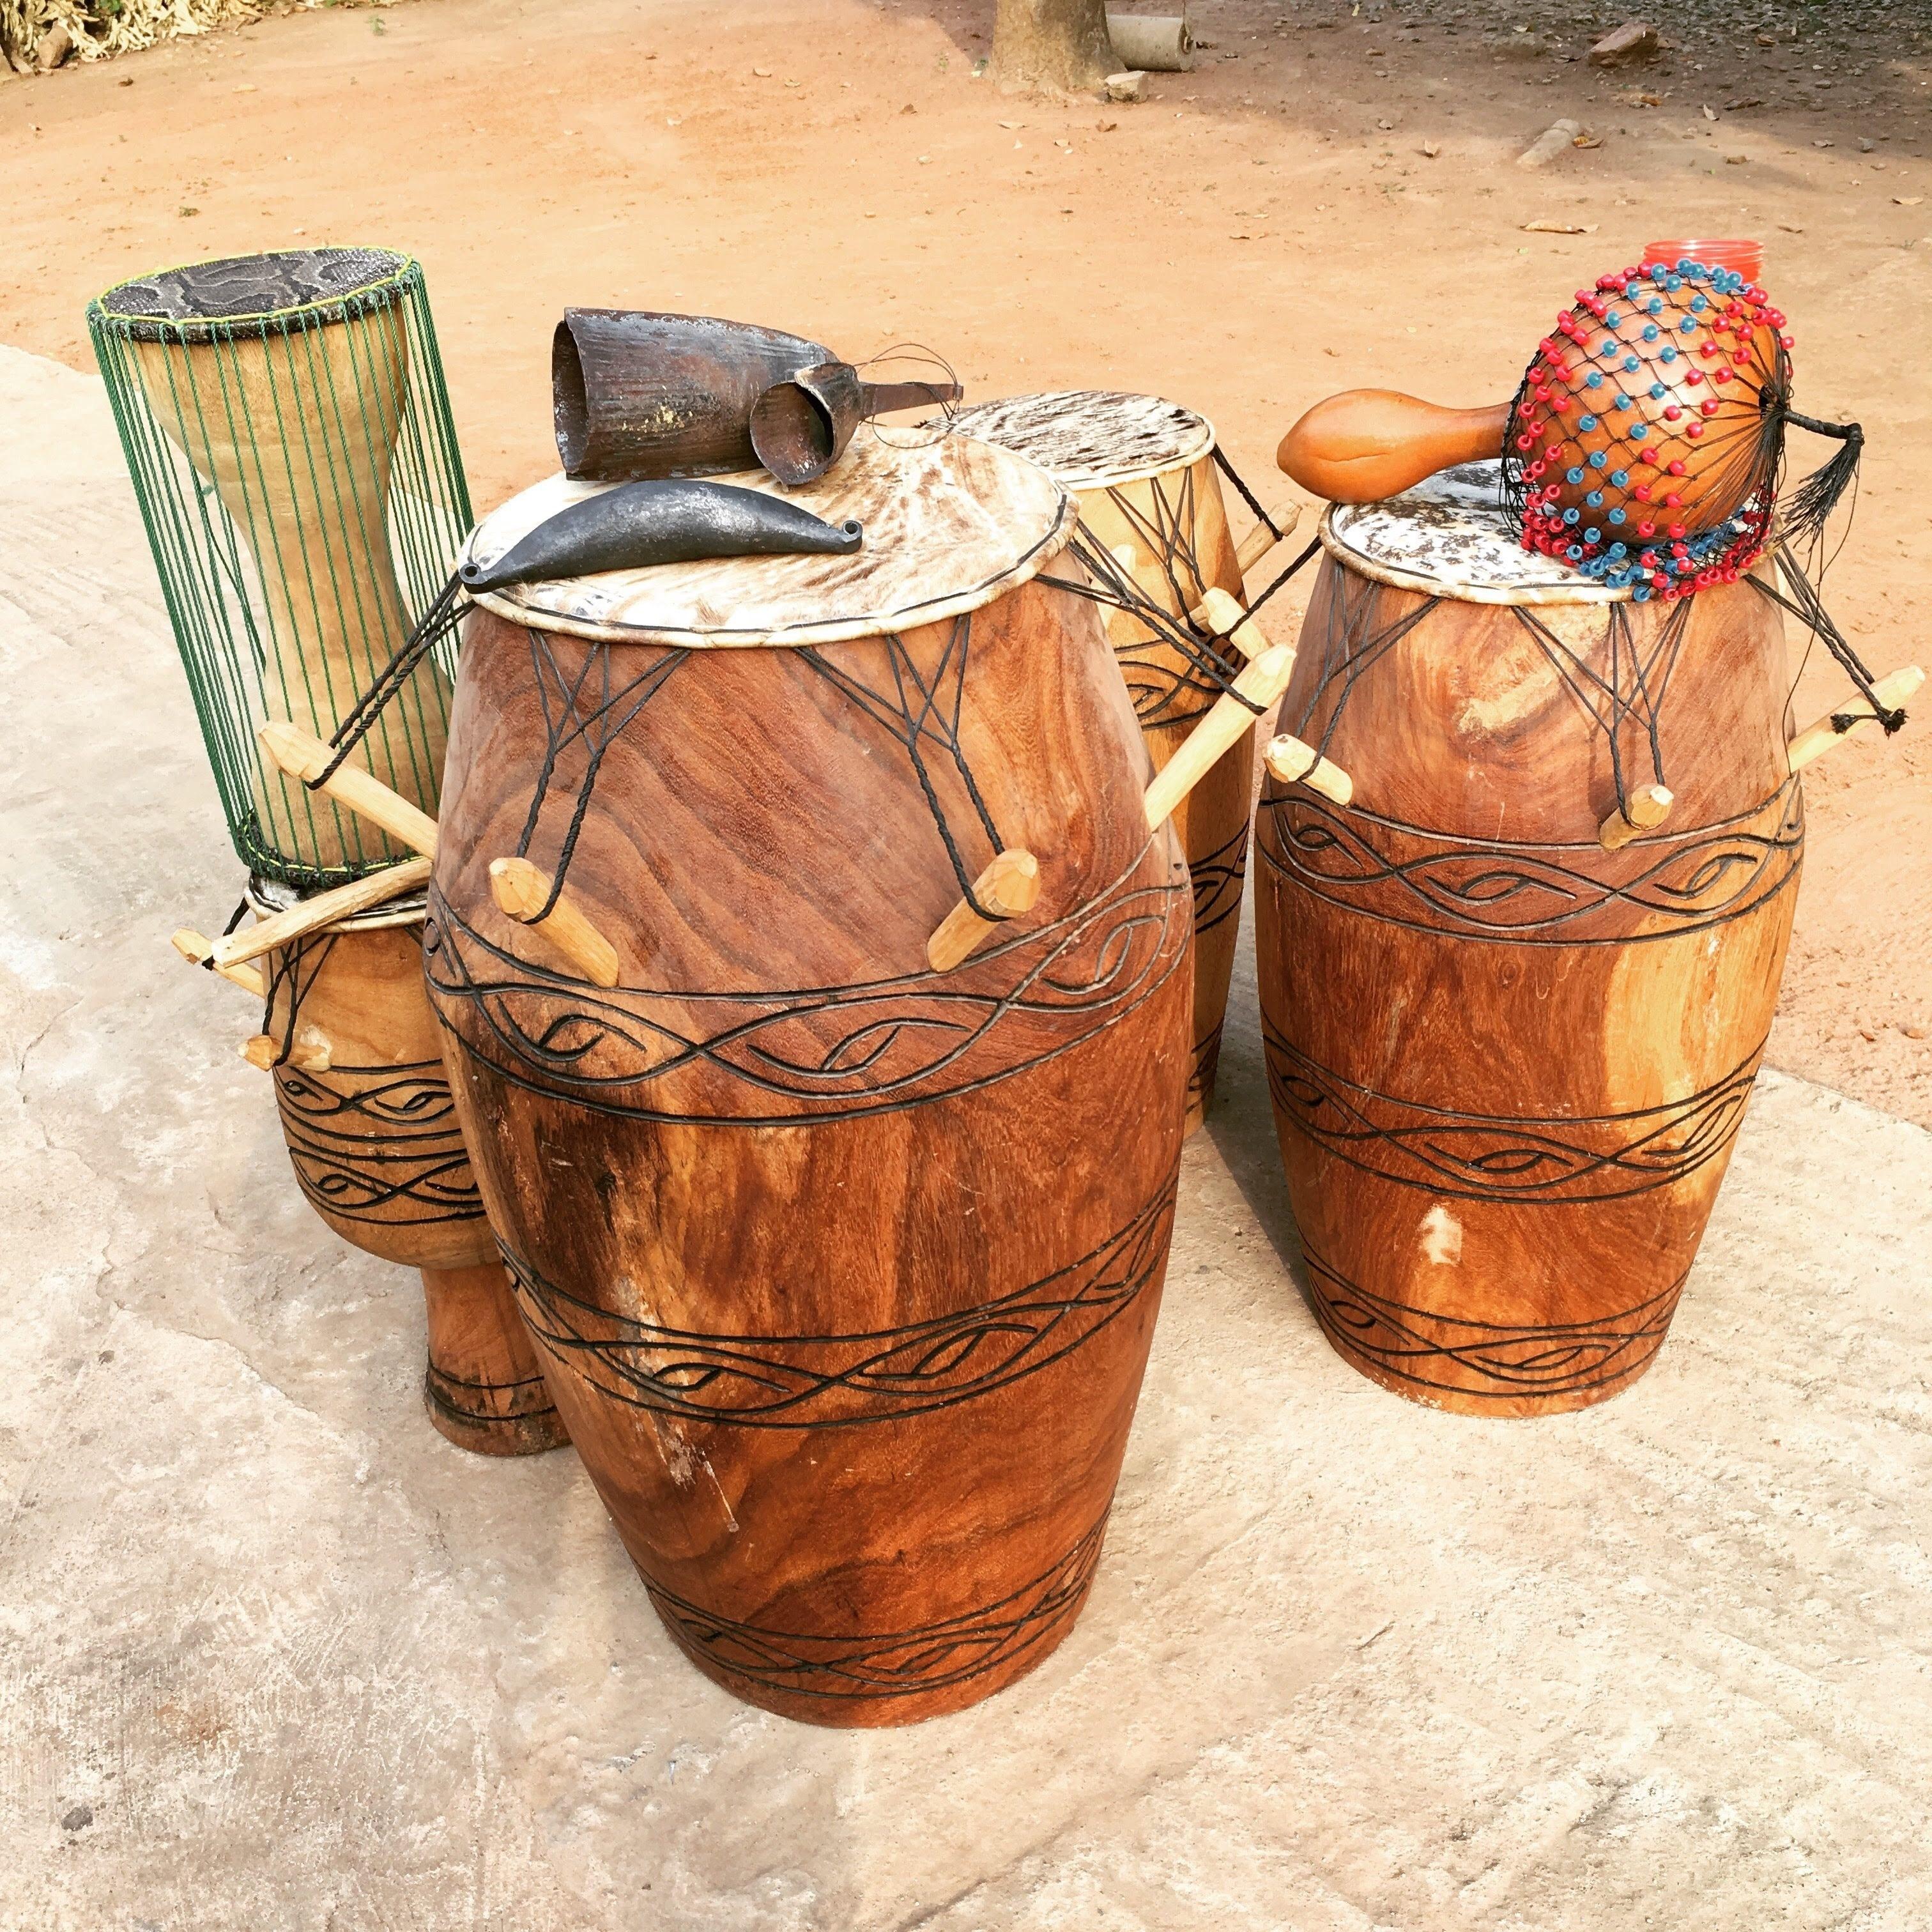 Adenta, Accra Region, Ghana